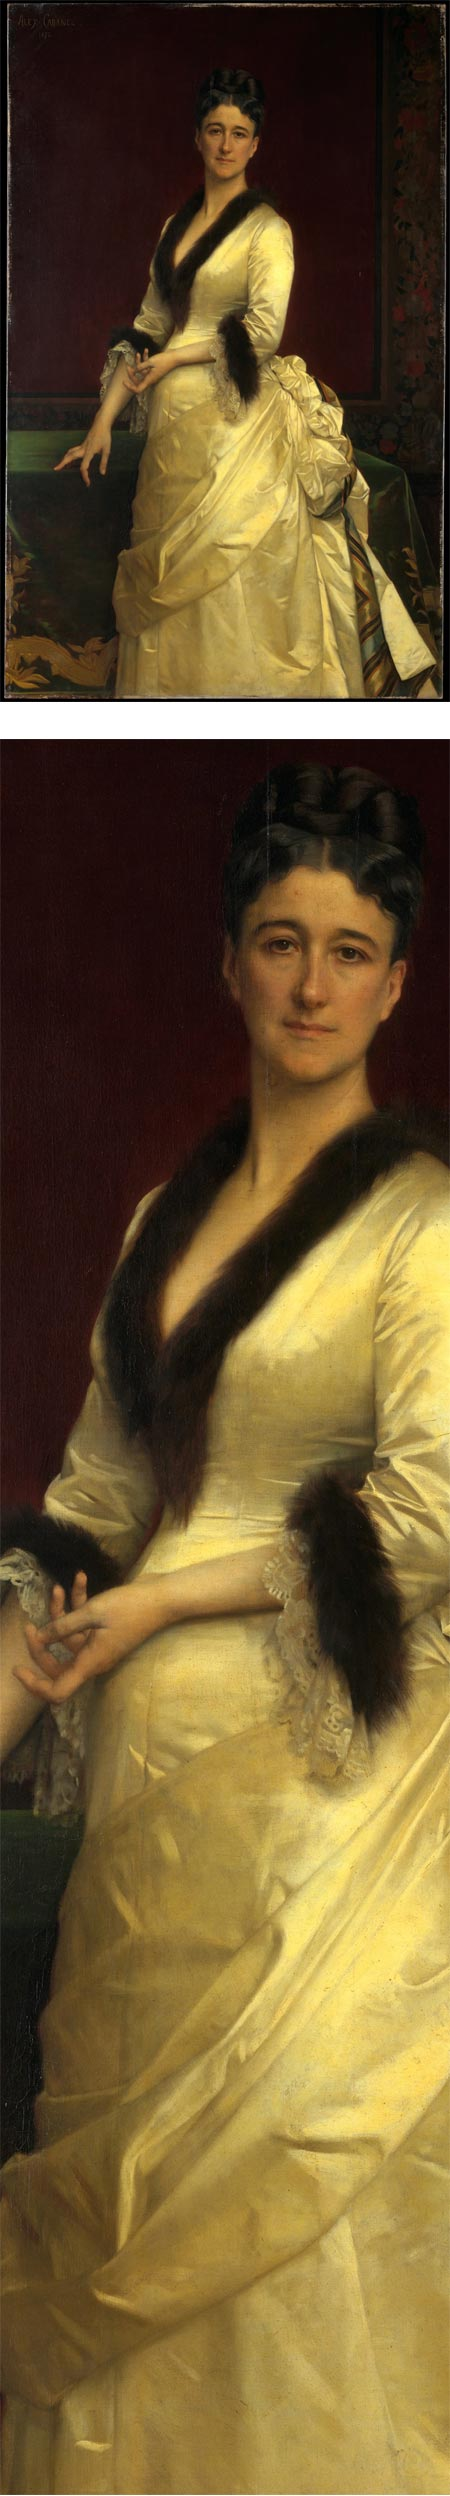 Catharine Lorillard Wolfe, by Alexandre Cabanel